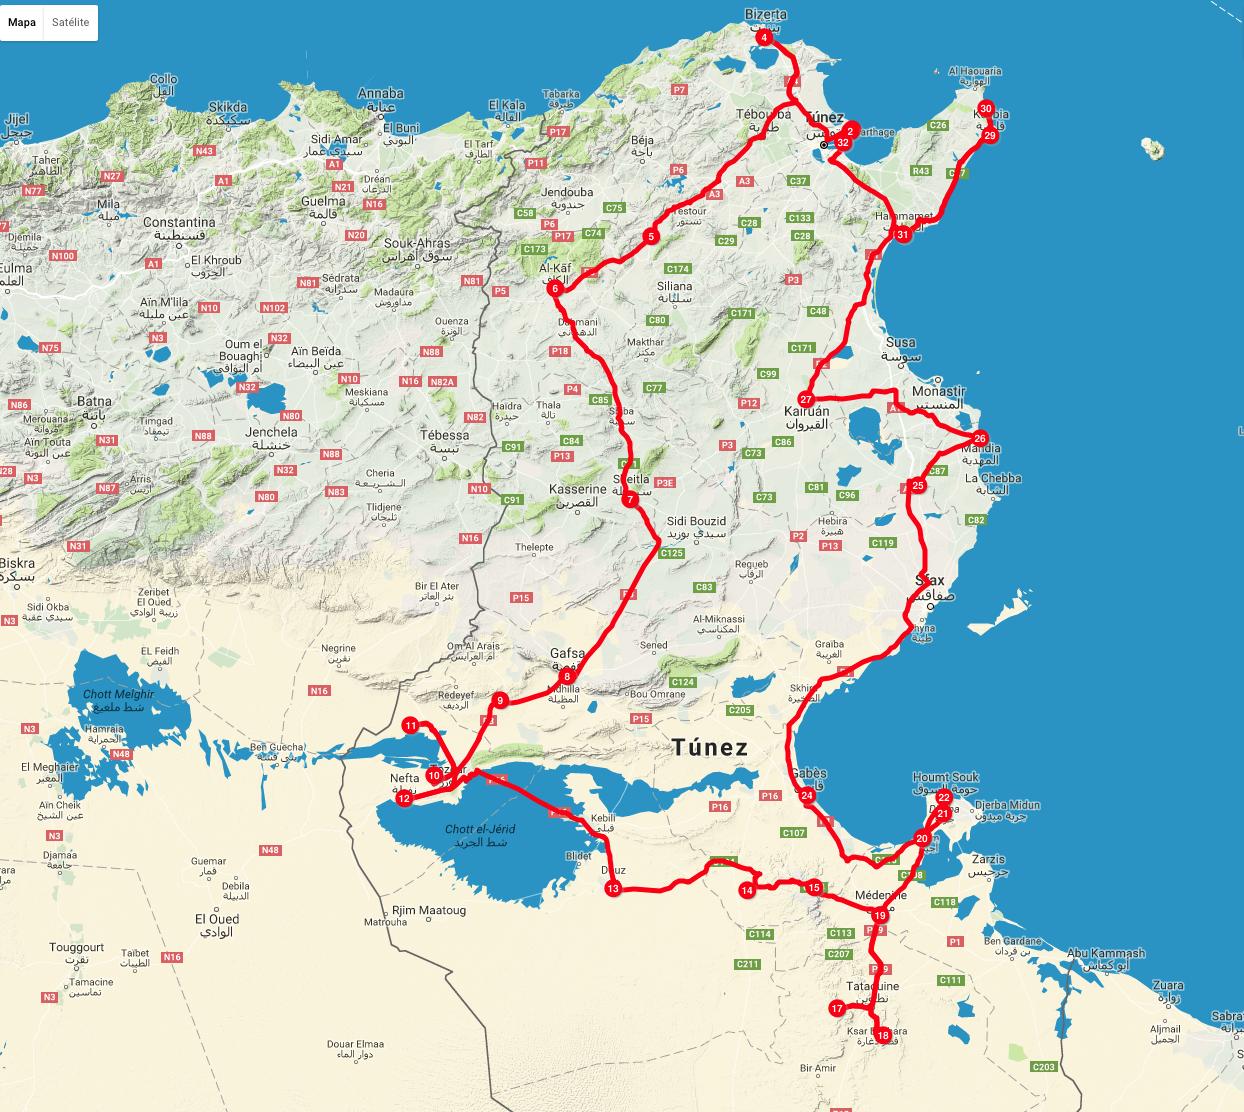 Mapa ruta tunez